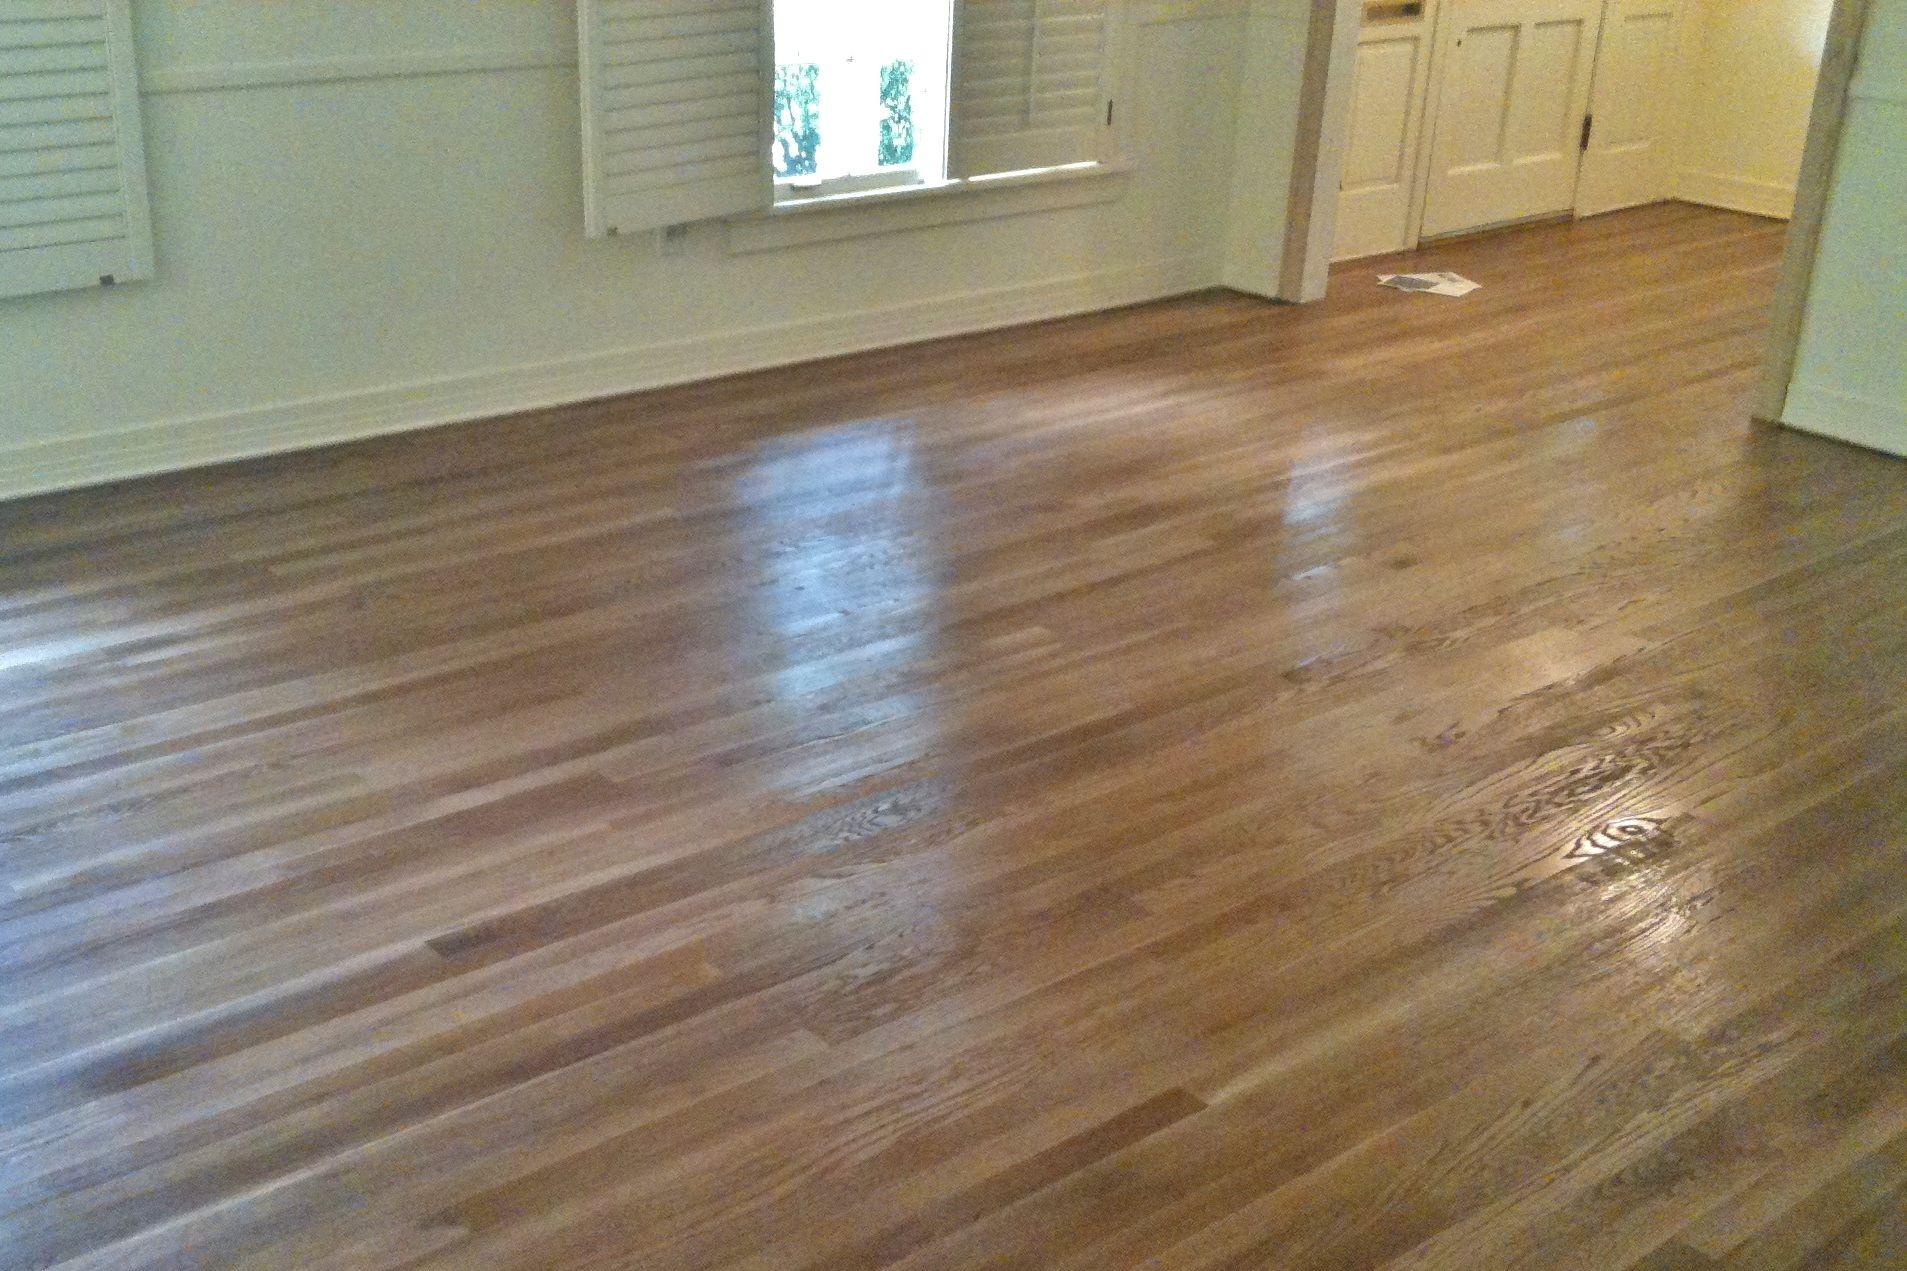 hardwood floor refinishing washington dc of oak meet special walnut home design pinterest flooring in minwax special walnut stain on oak hardwood floors walnut hardwood flooring refinishing hardwood